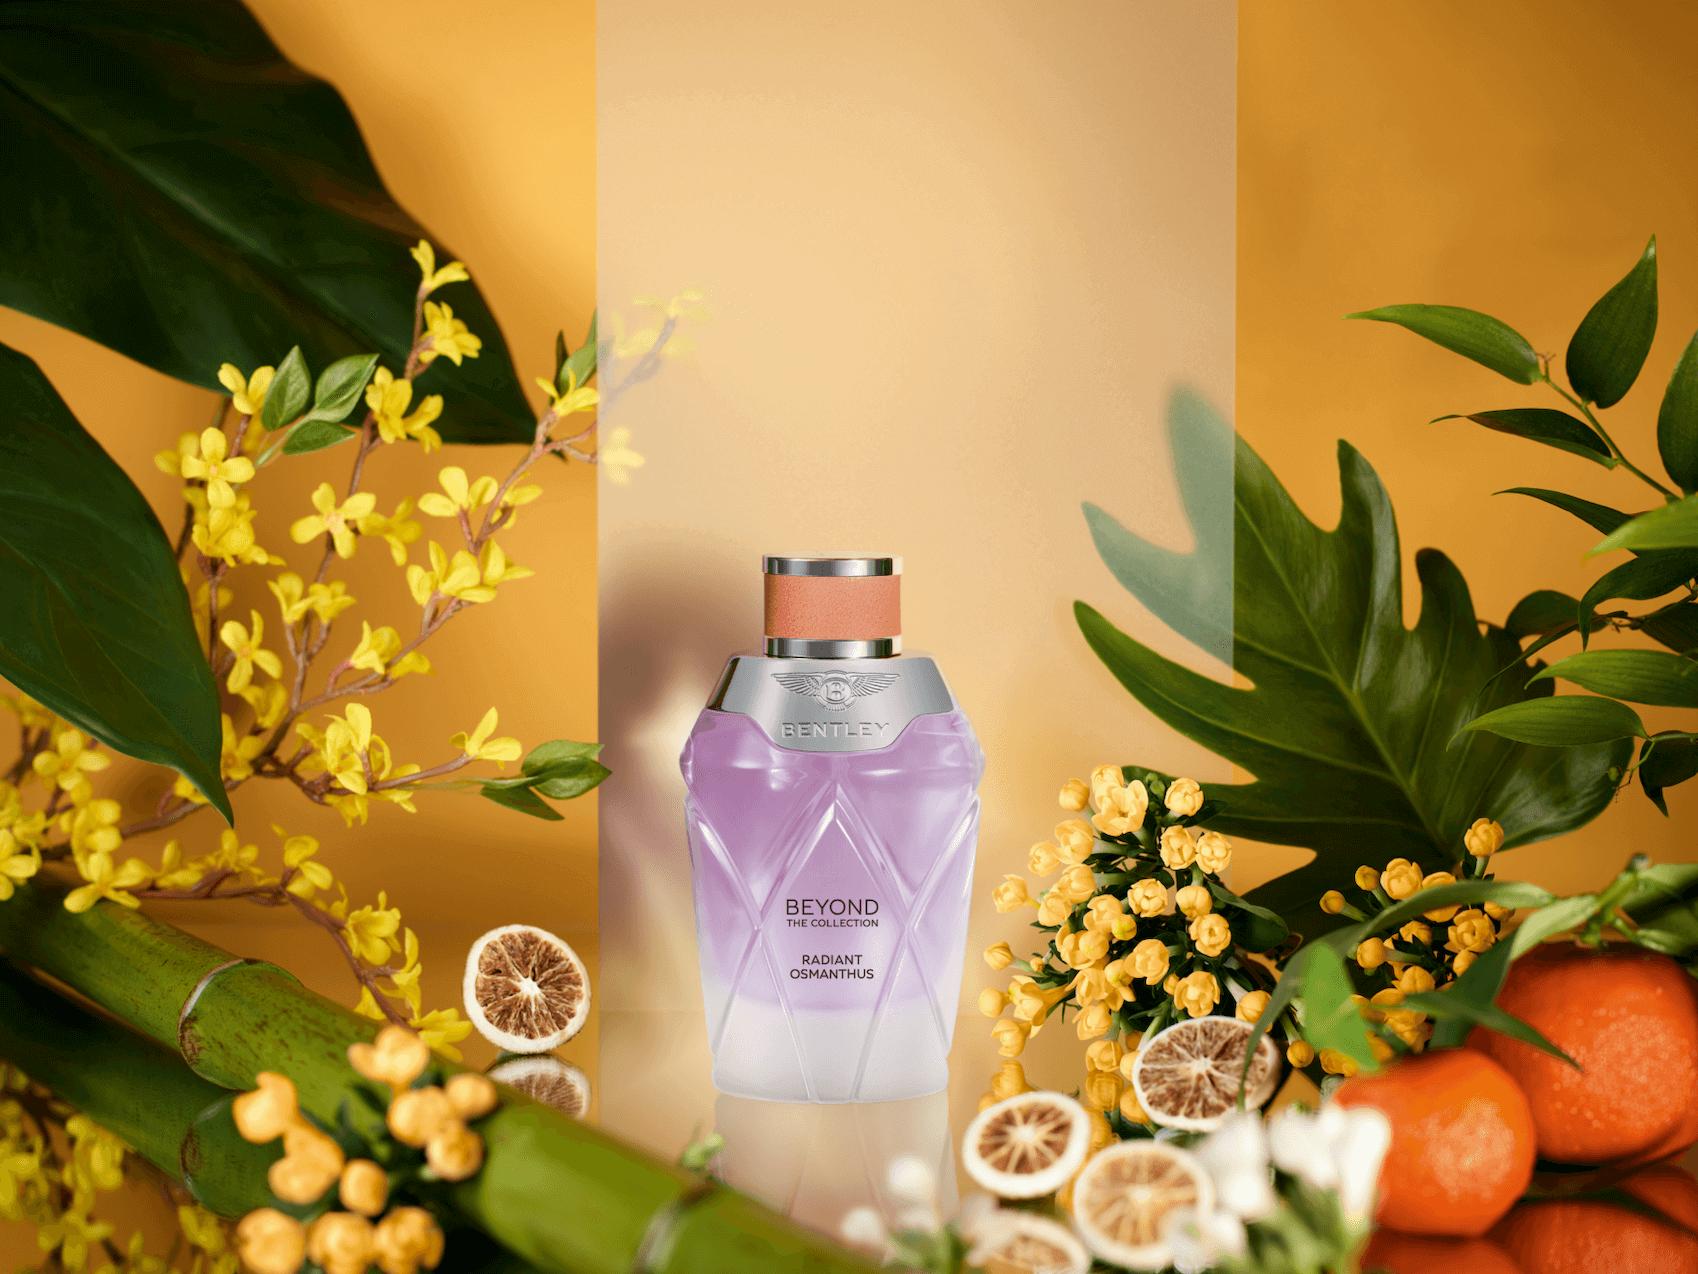 Bentley Fragrances parfüm bilgi